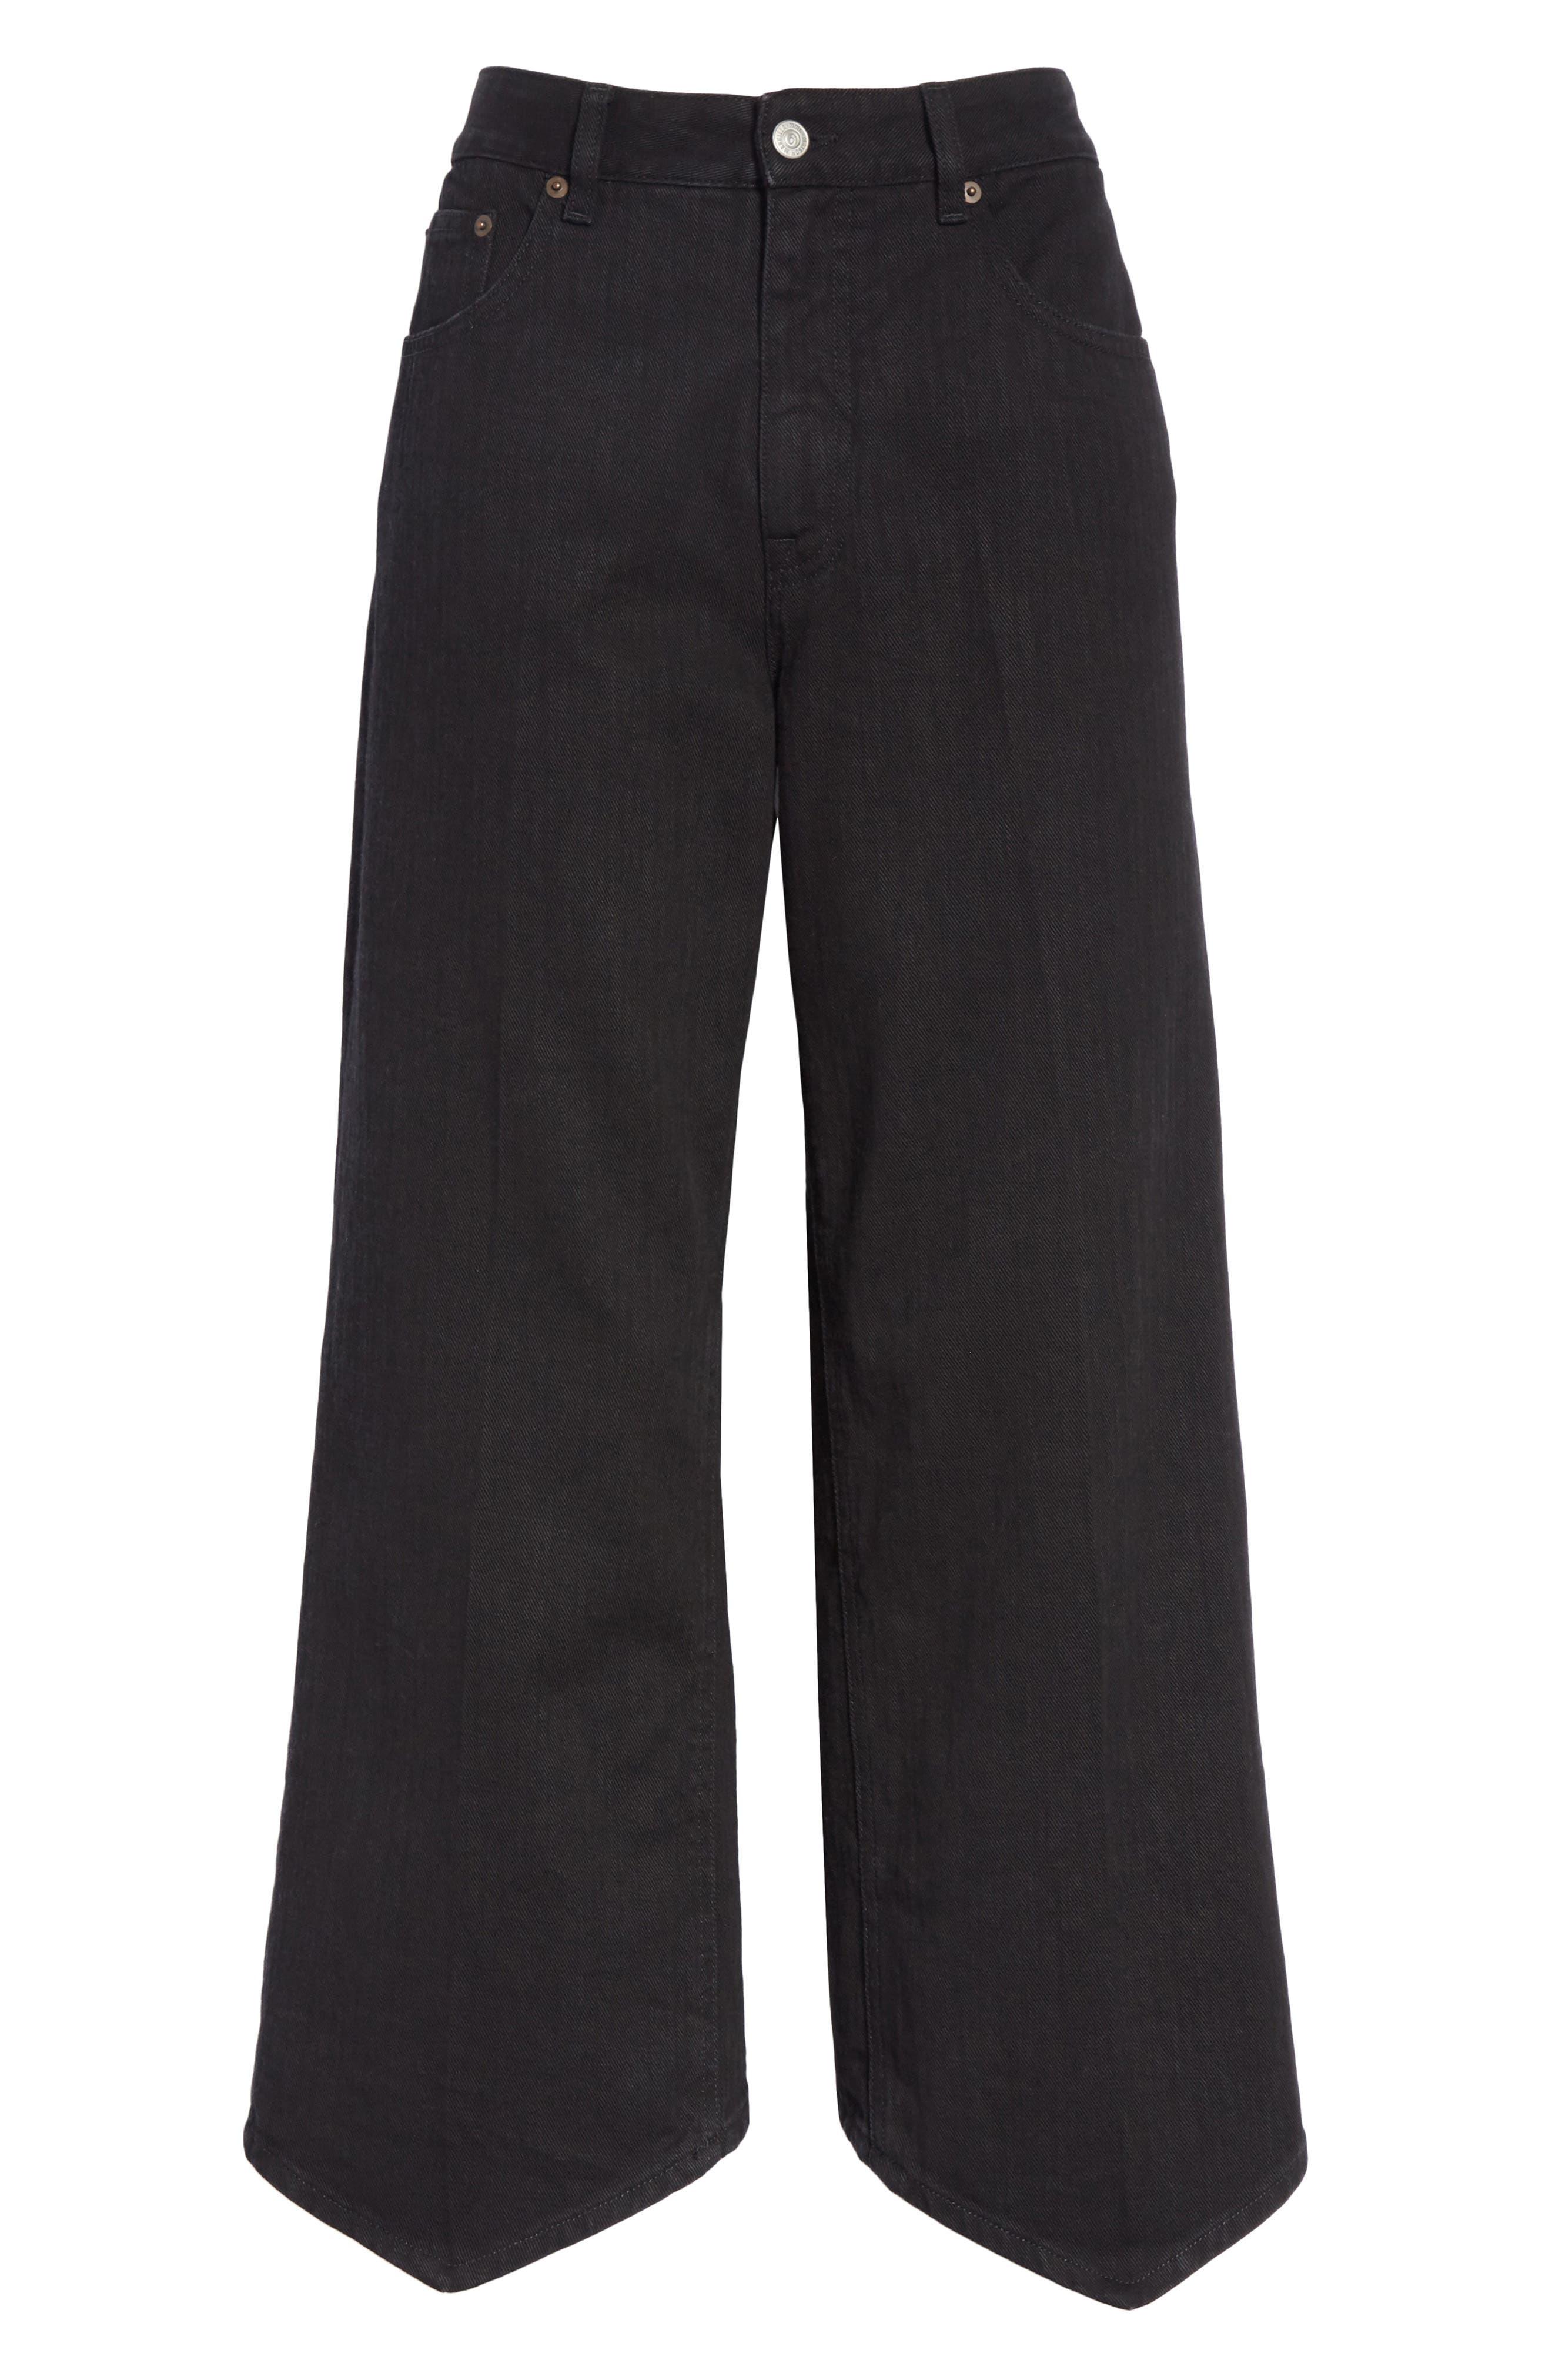 Just Wash Point Hem Wide Leg Jeans,                             Alternate thumbnail 6, color,                             001